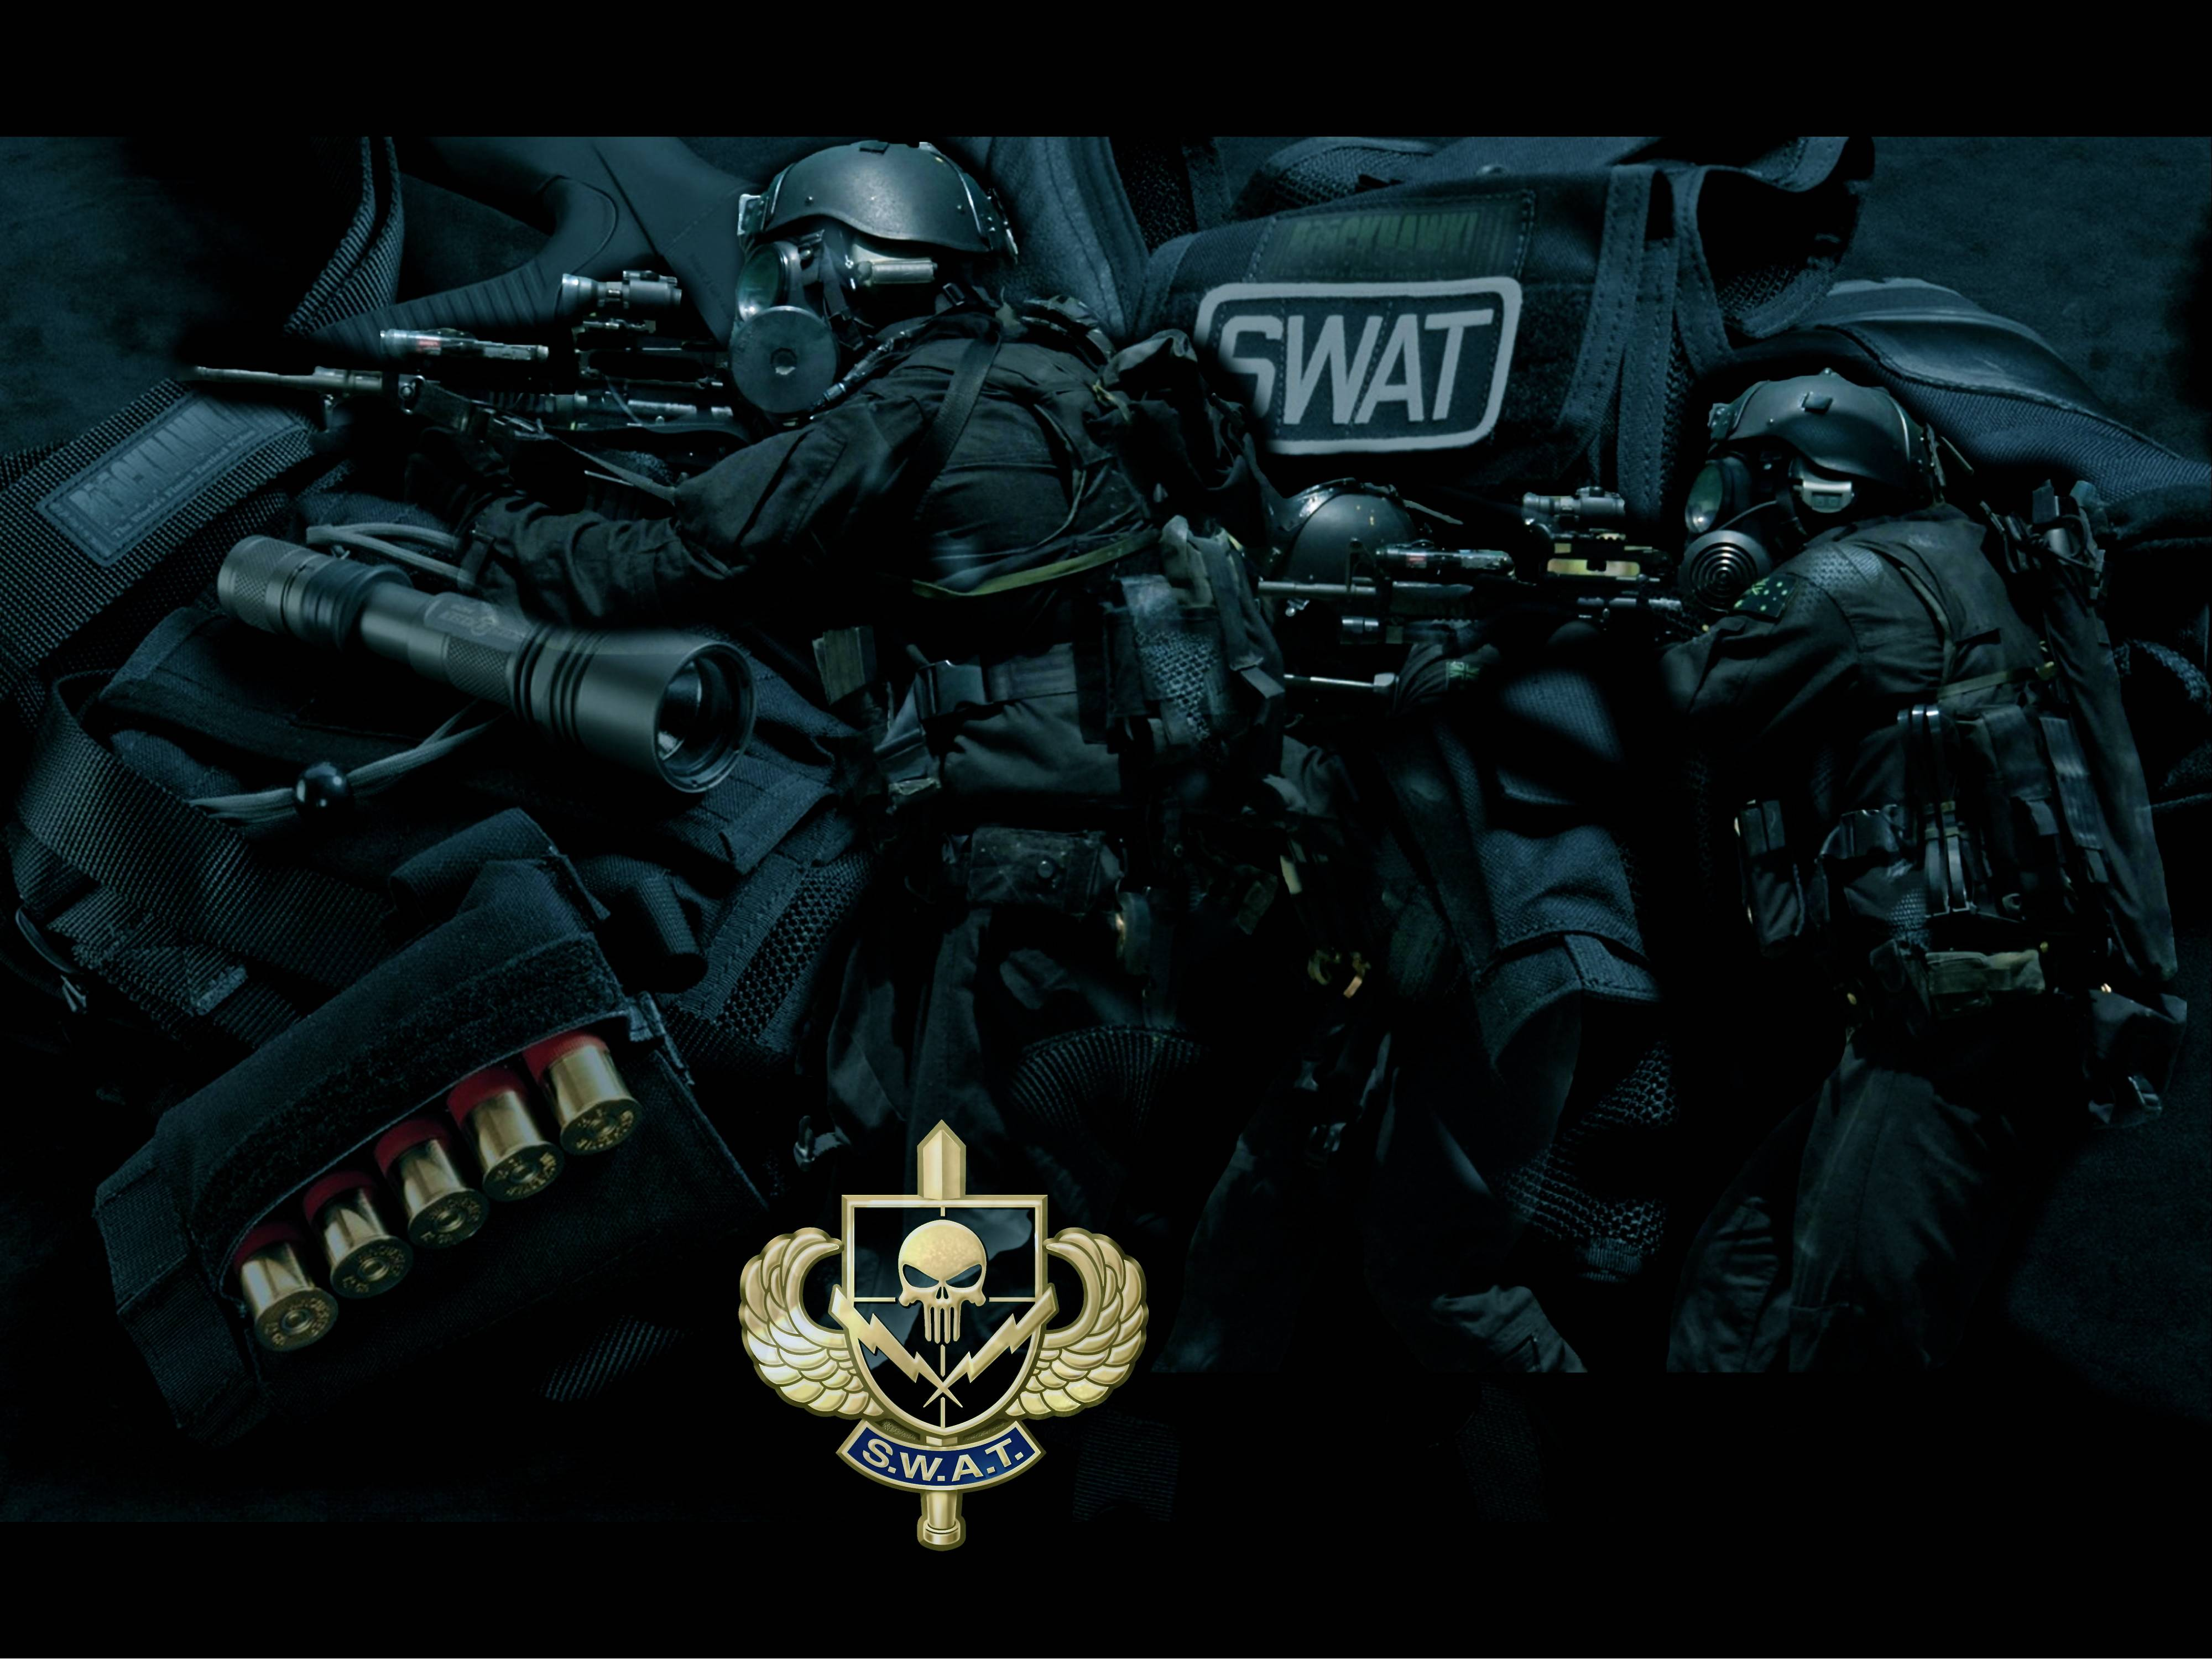 Swat Team Wallpapers Wallpaper Cave